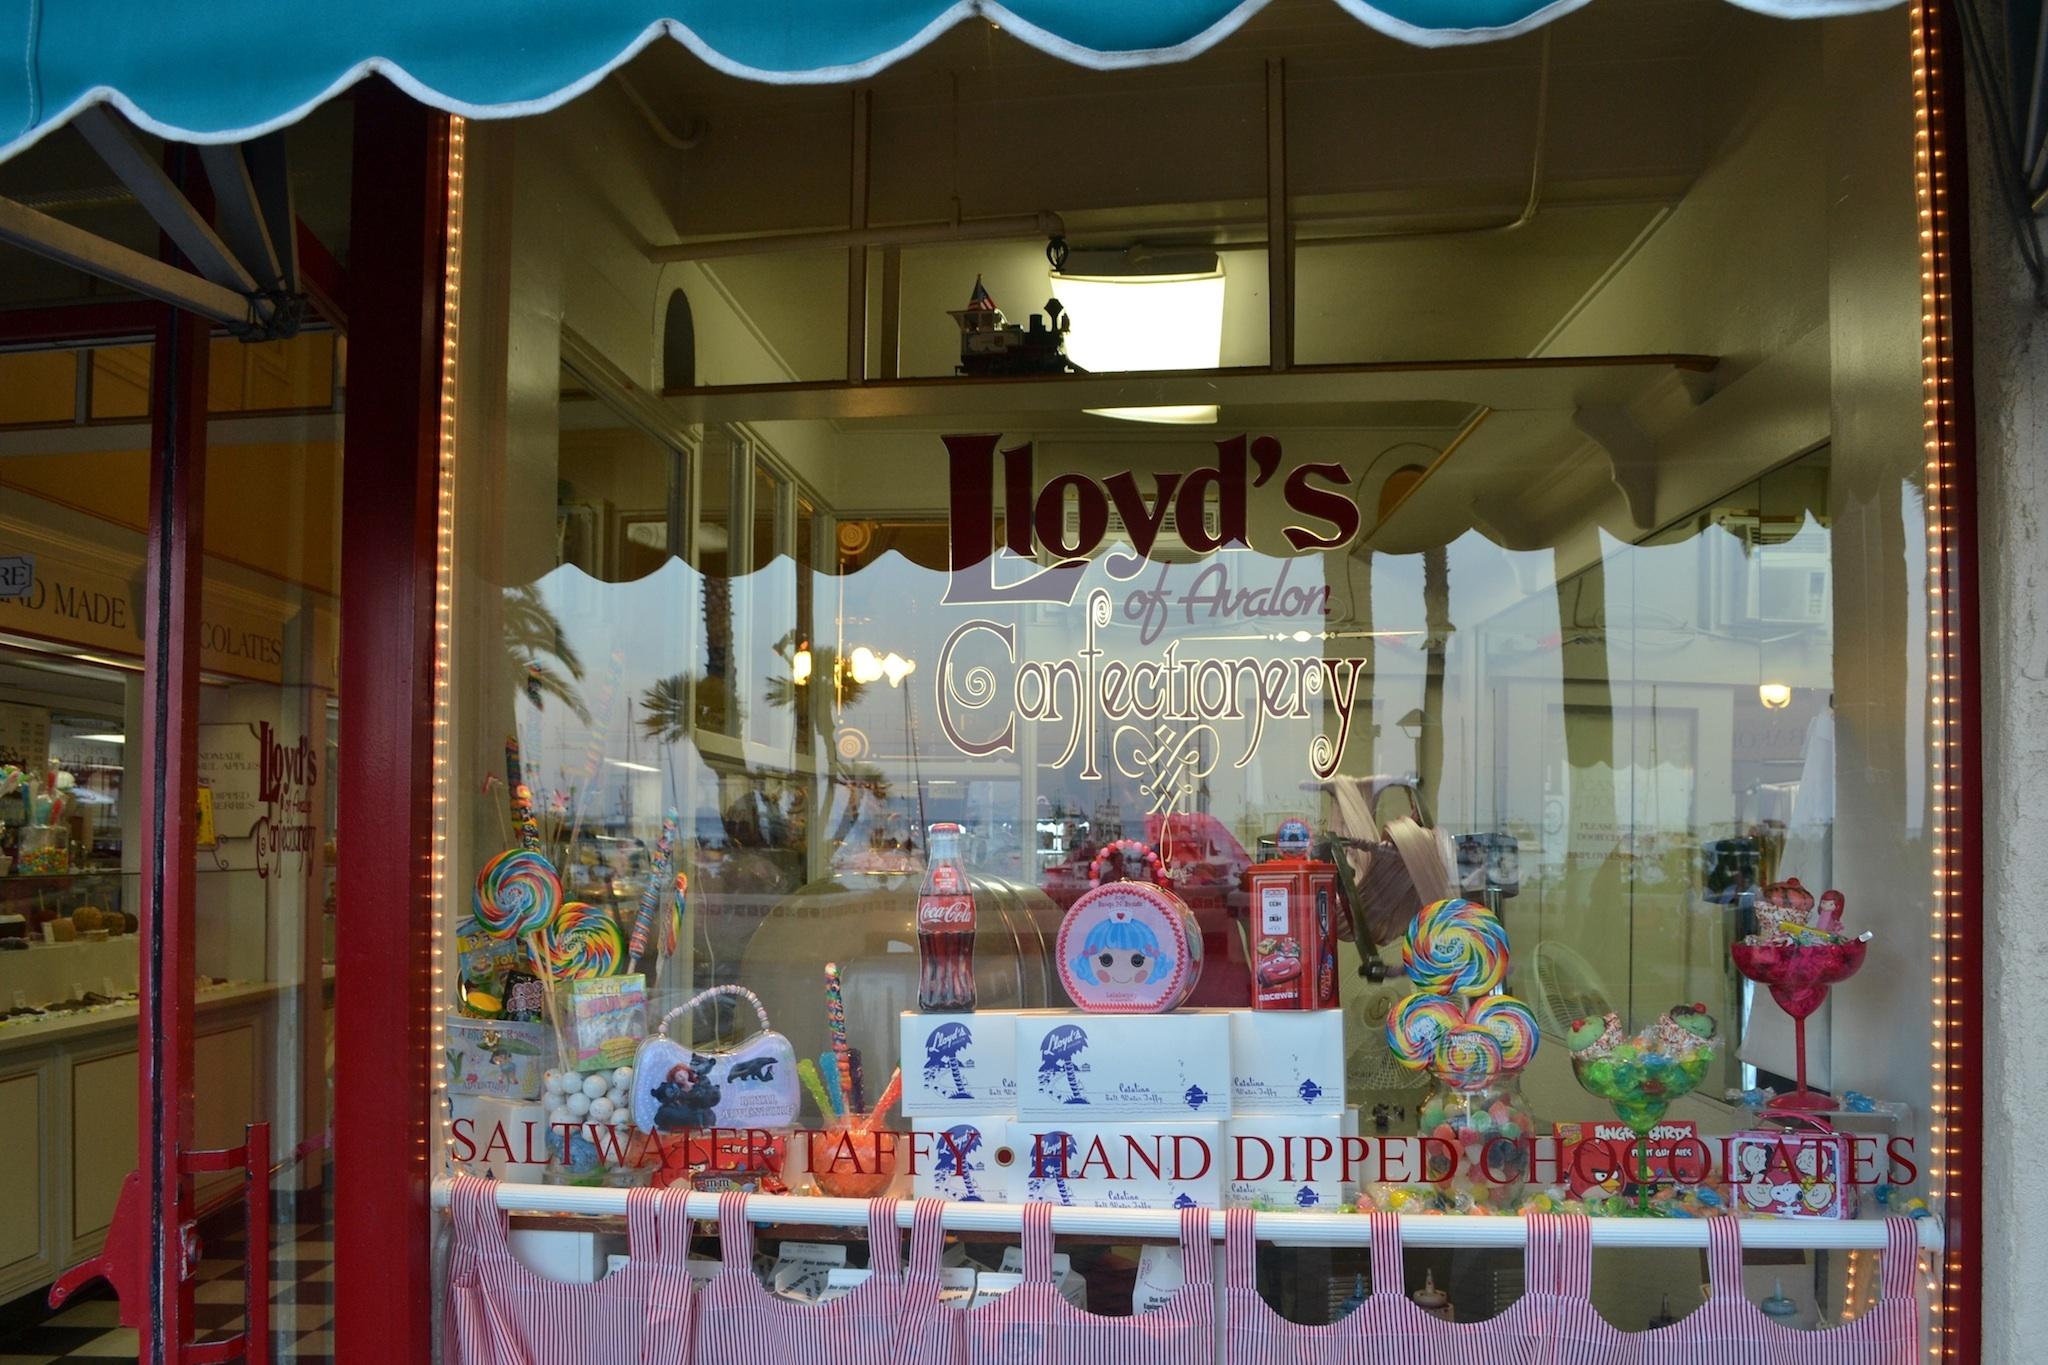 Lloyd's of Avalon Confectionary